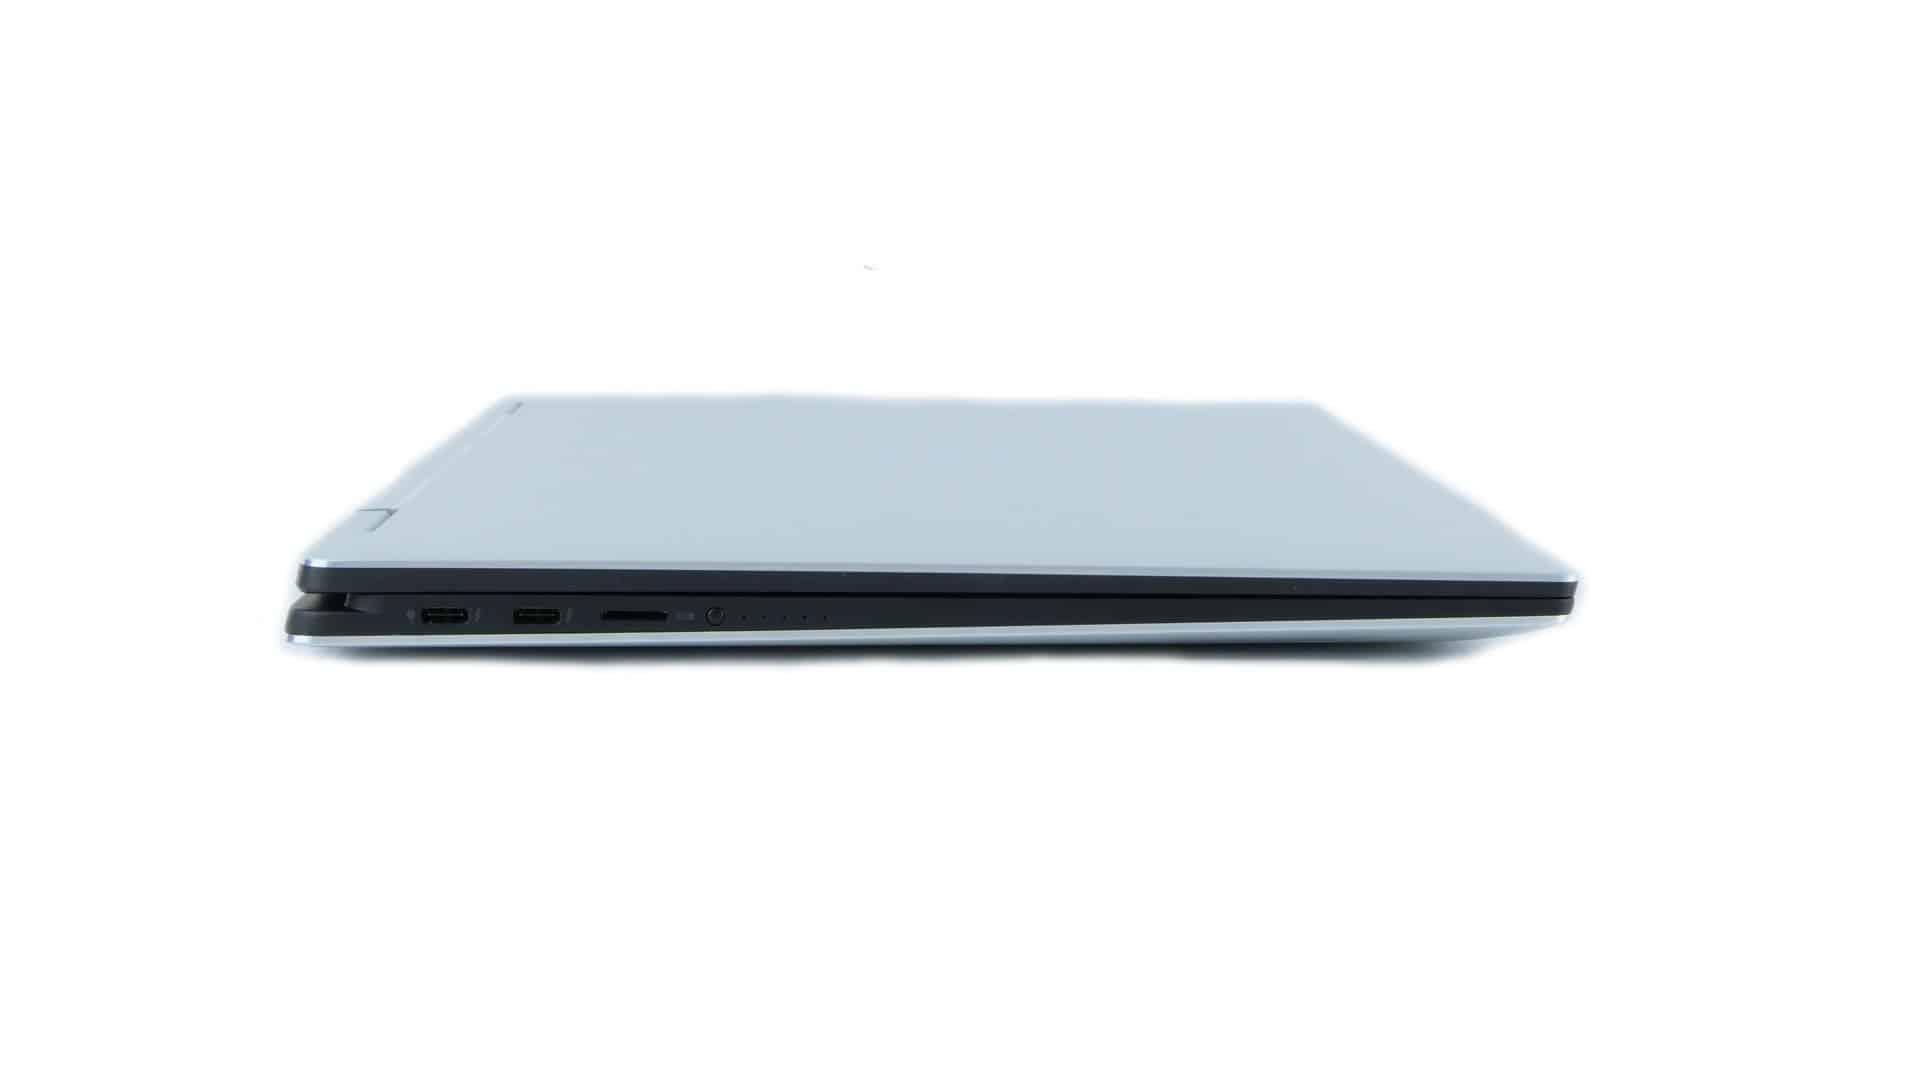 Dell XPS 15 9575 2 w1 - porty naboku lewym